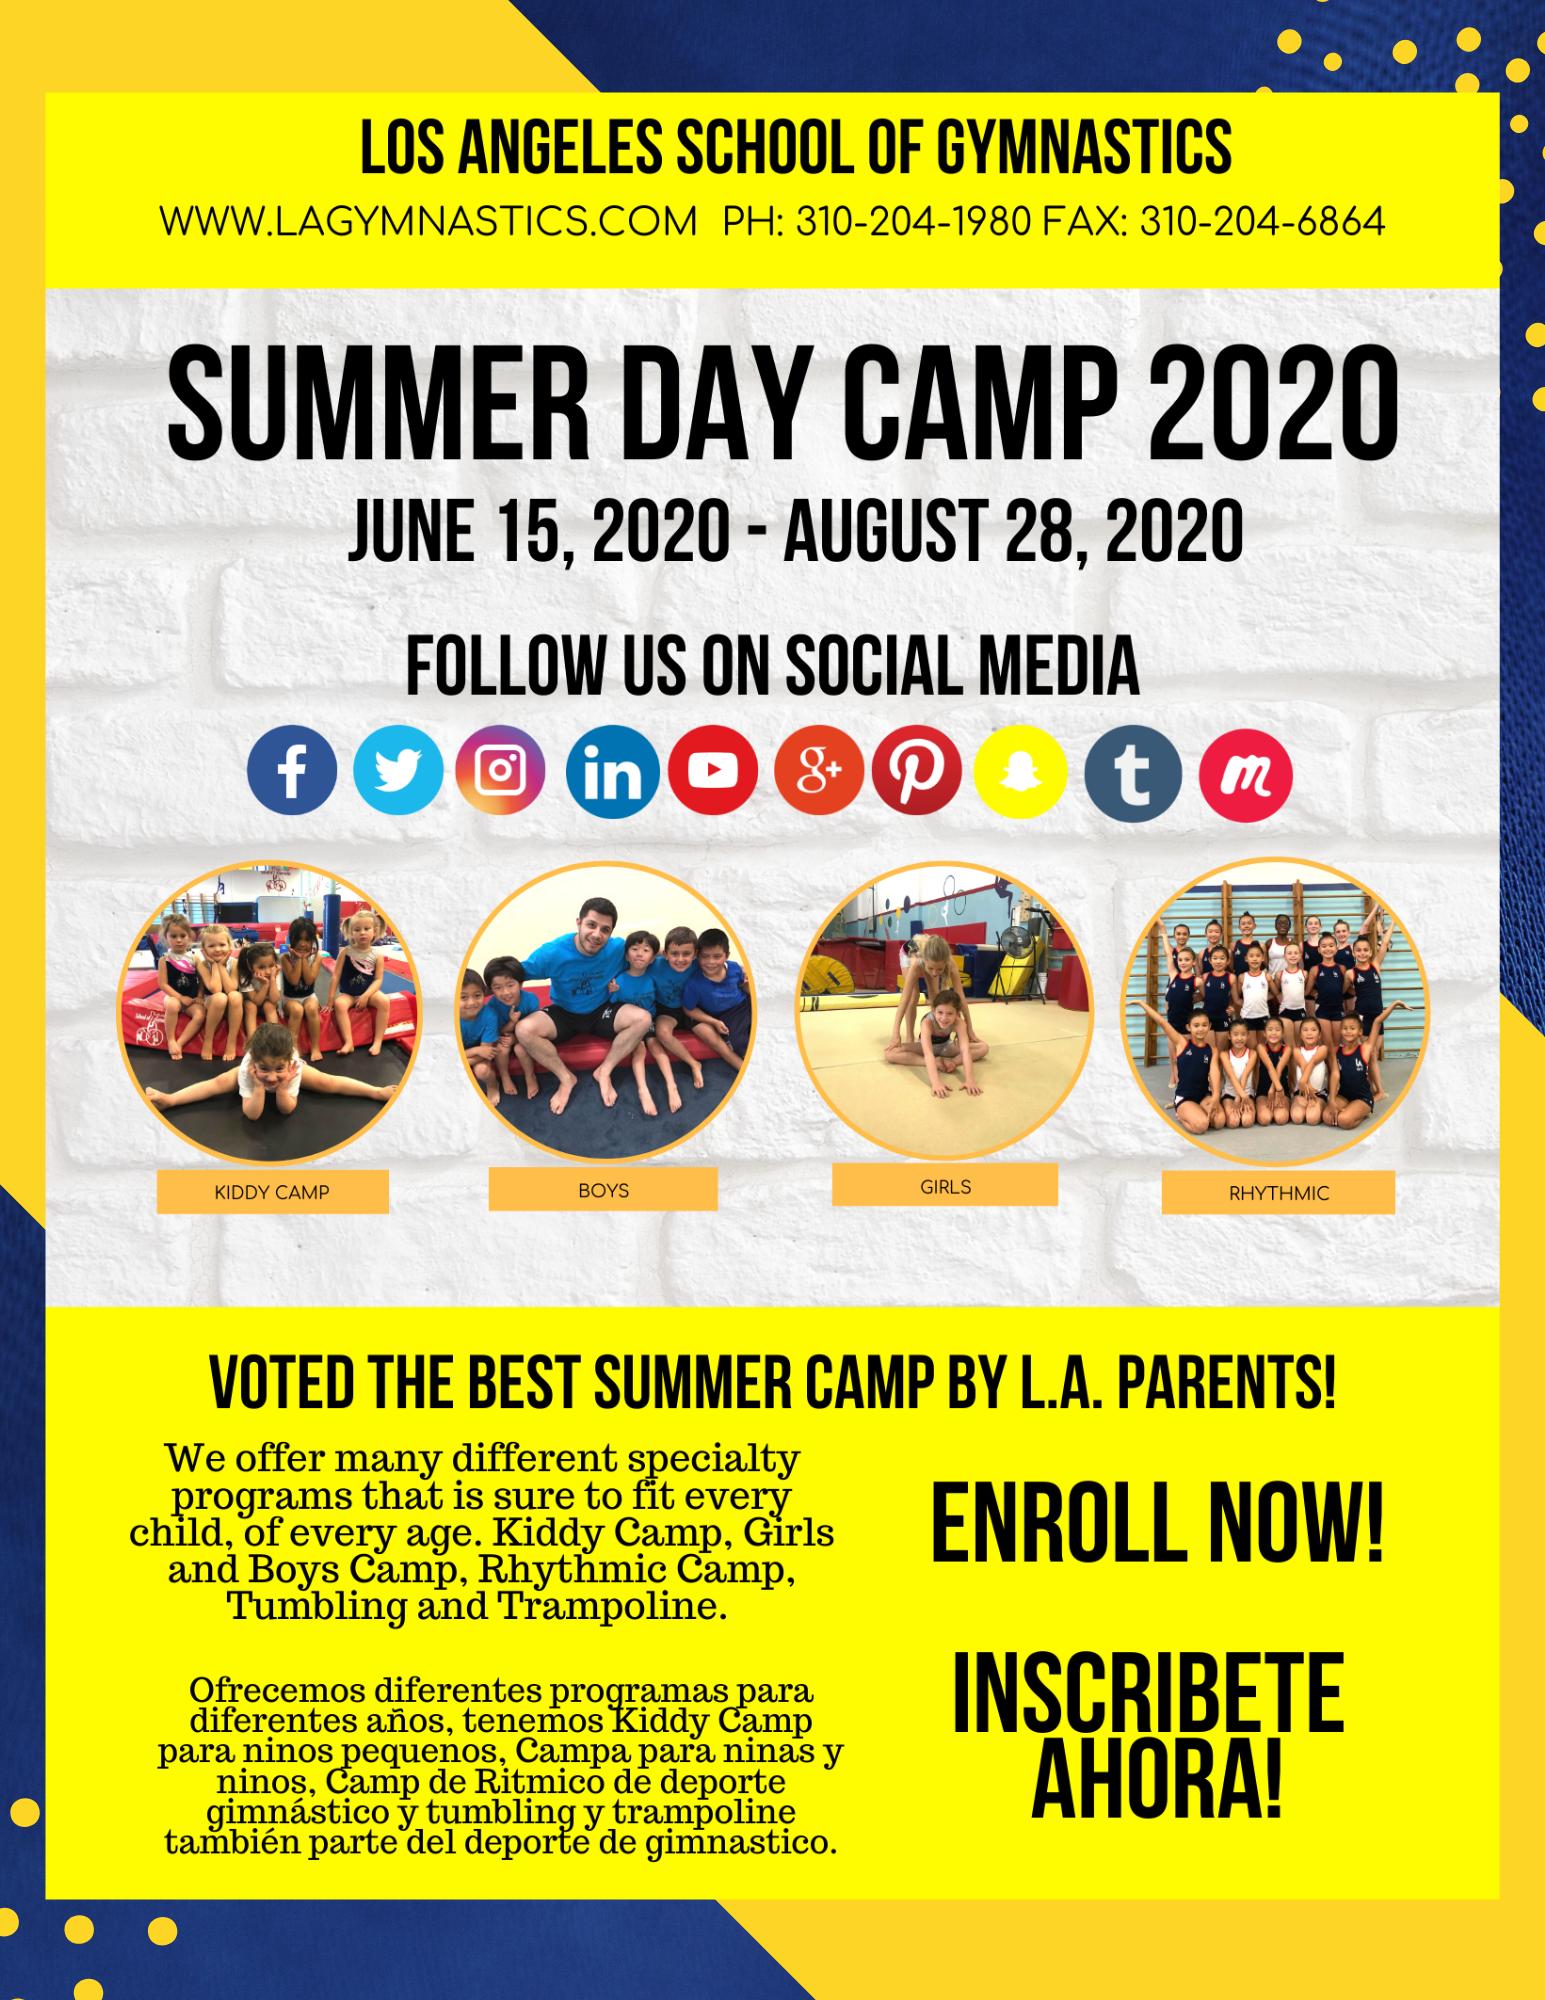 Summer Camp 2020 In 2020 Summer Camp Gymnastics Camp Gymnastics